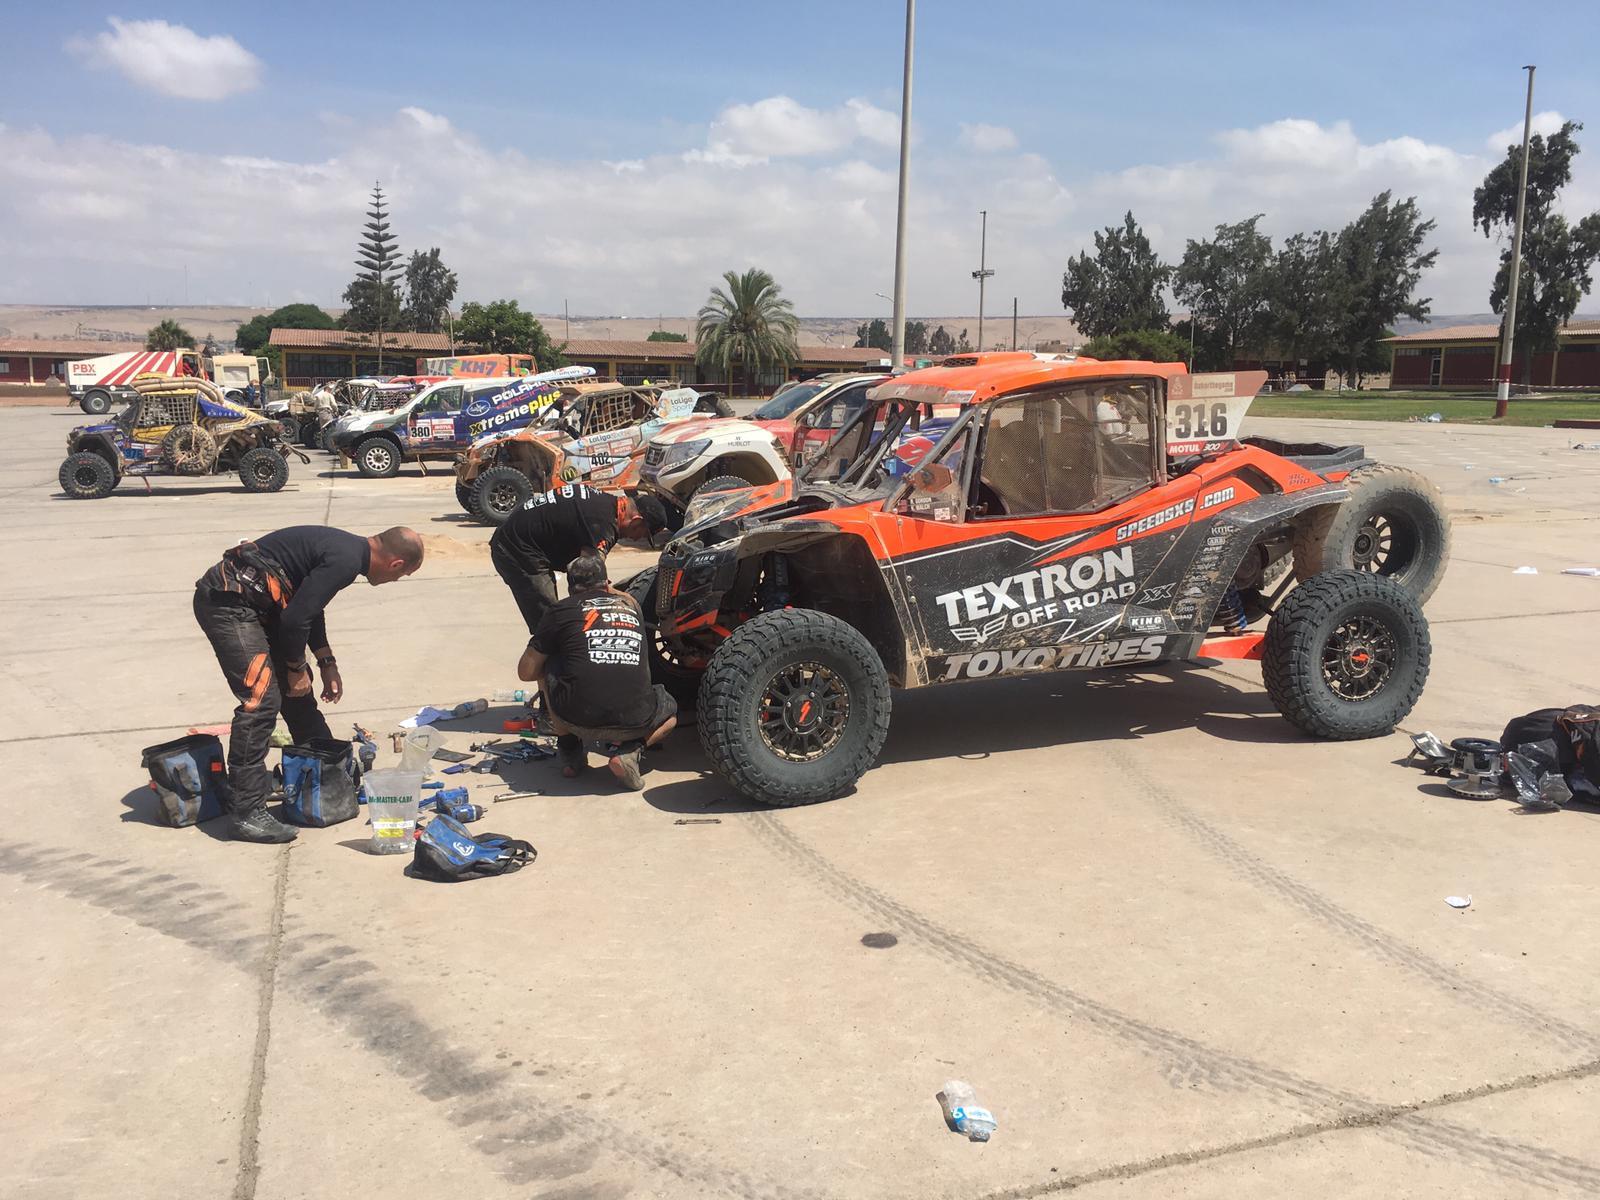 Dakar 2019 - Página 4 DwpFc2cWkAAKAC1